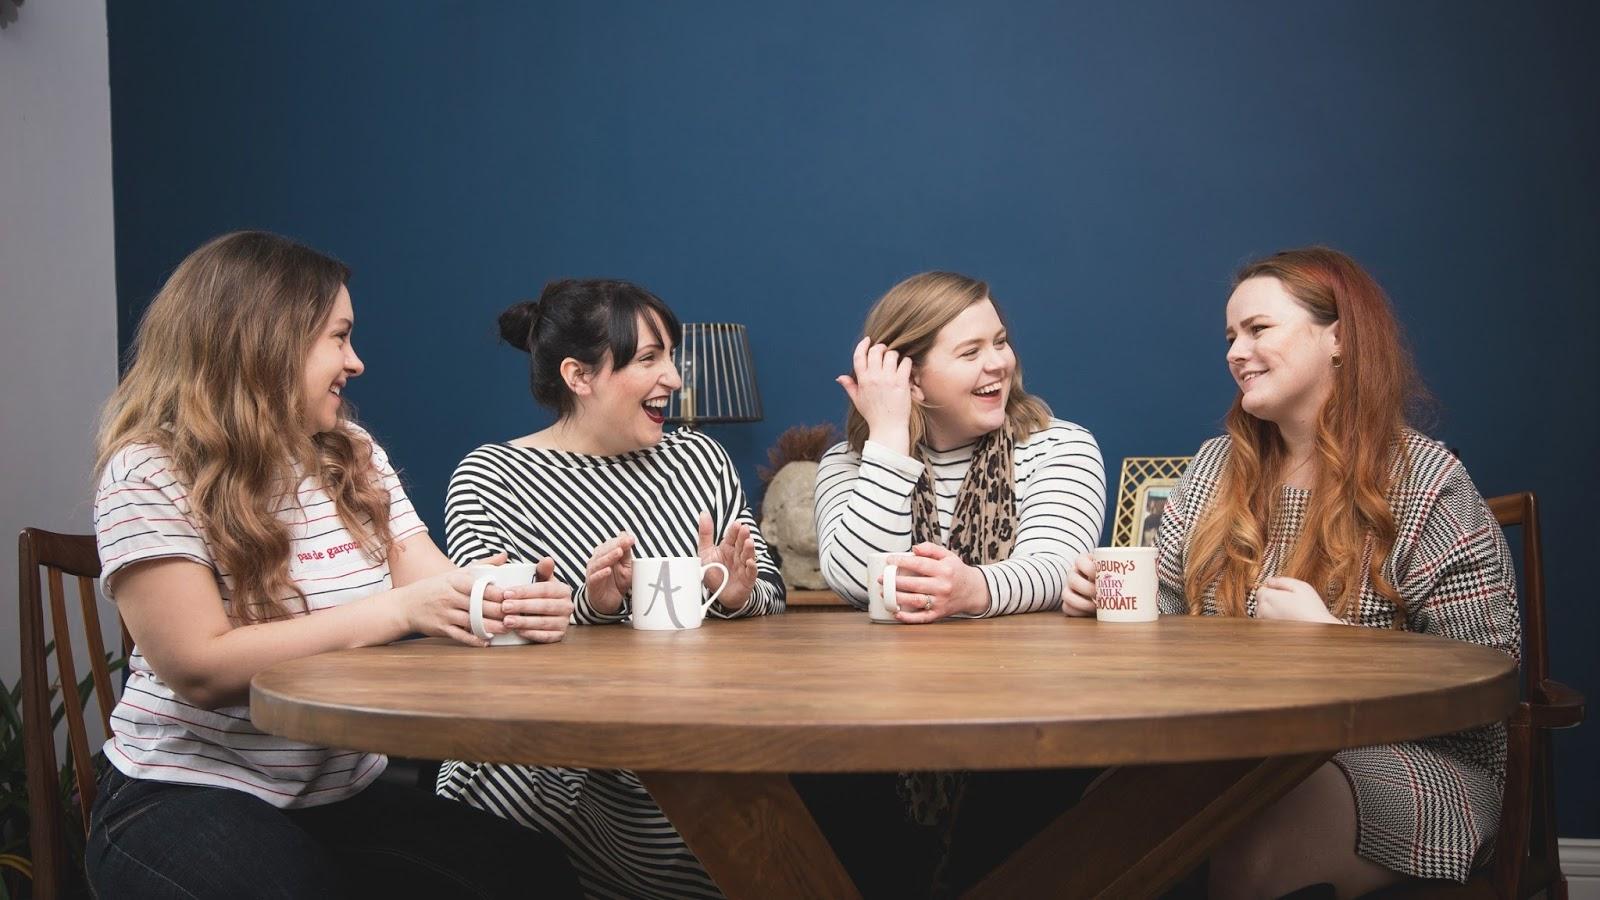 Celebrating Female Friendship